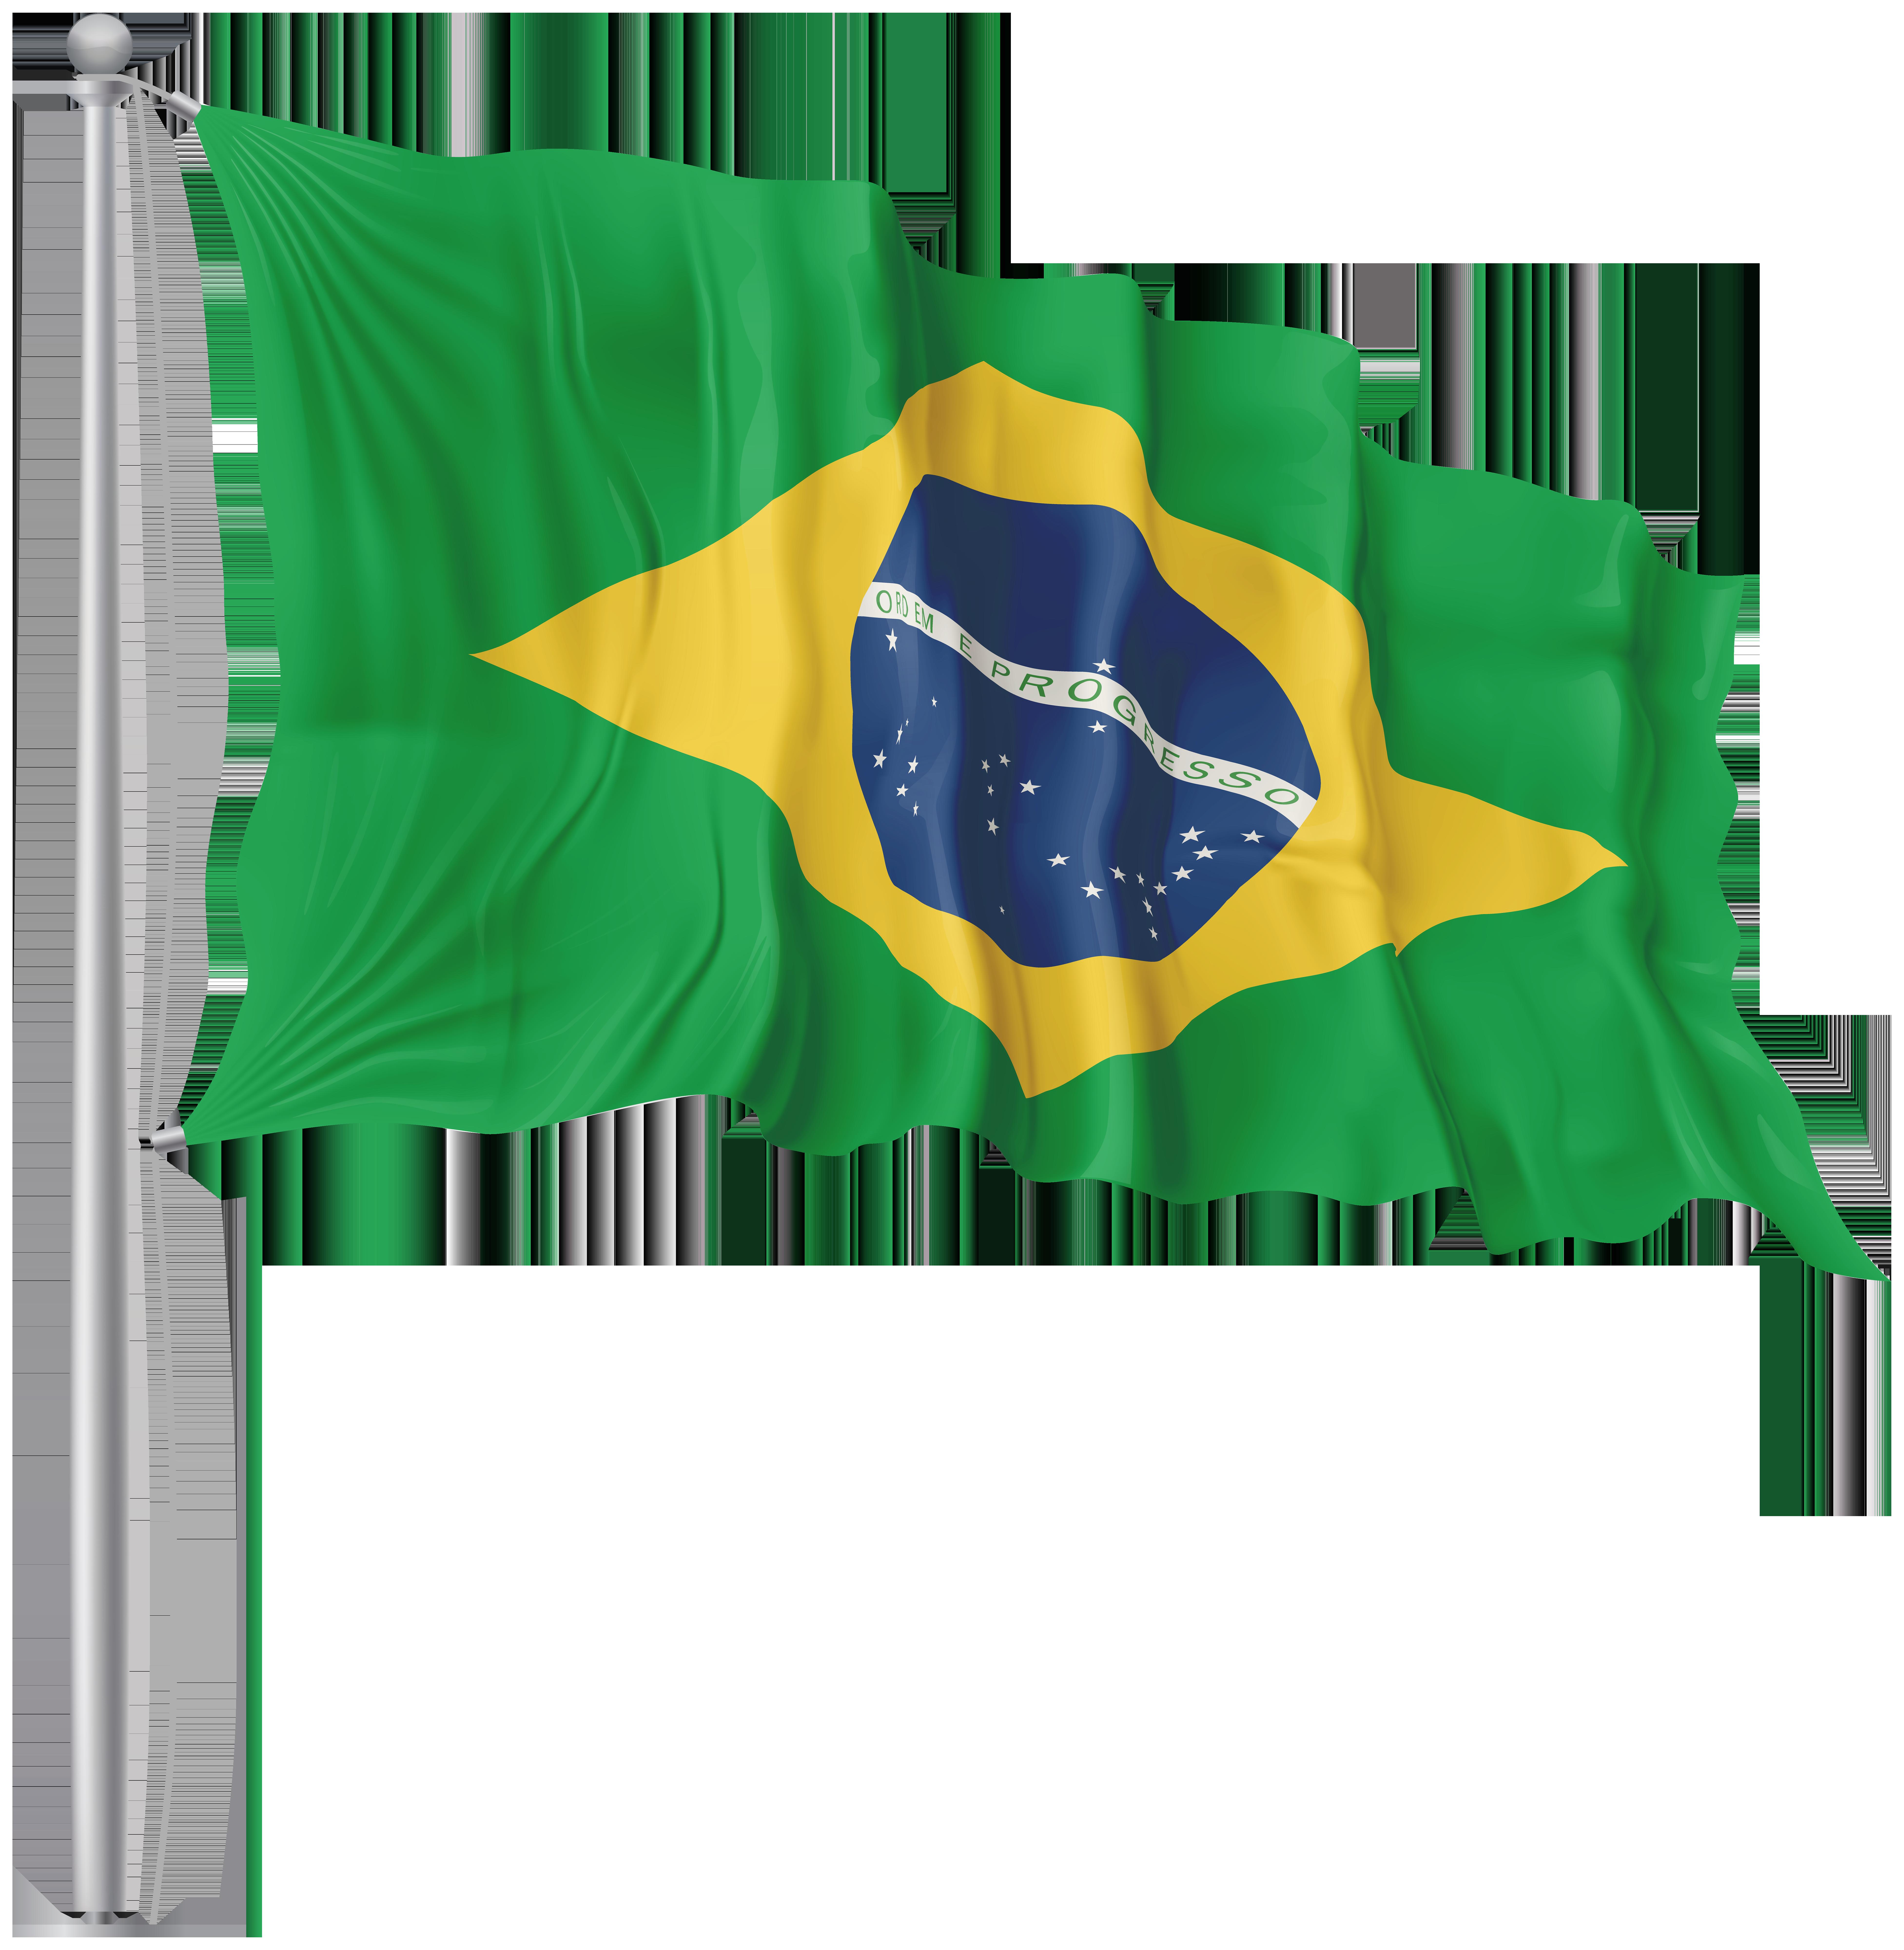 7811x8000 Brazil Waving Flag Png Imageu200b Gallery Yopriceville